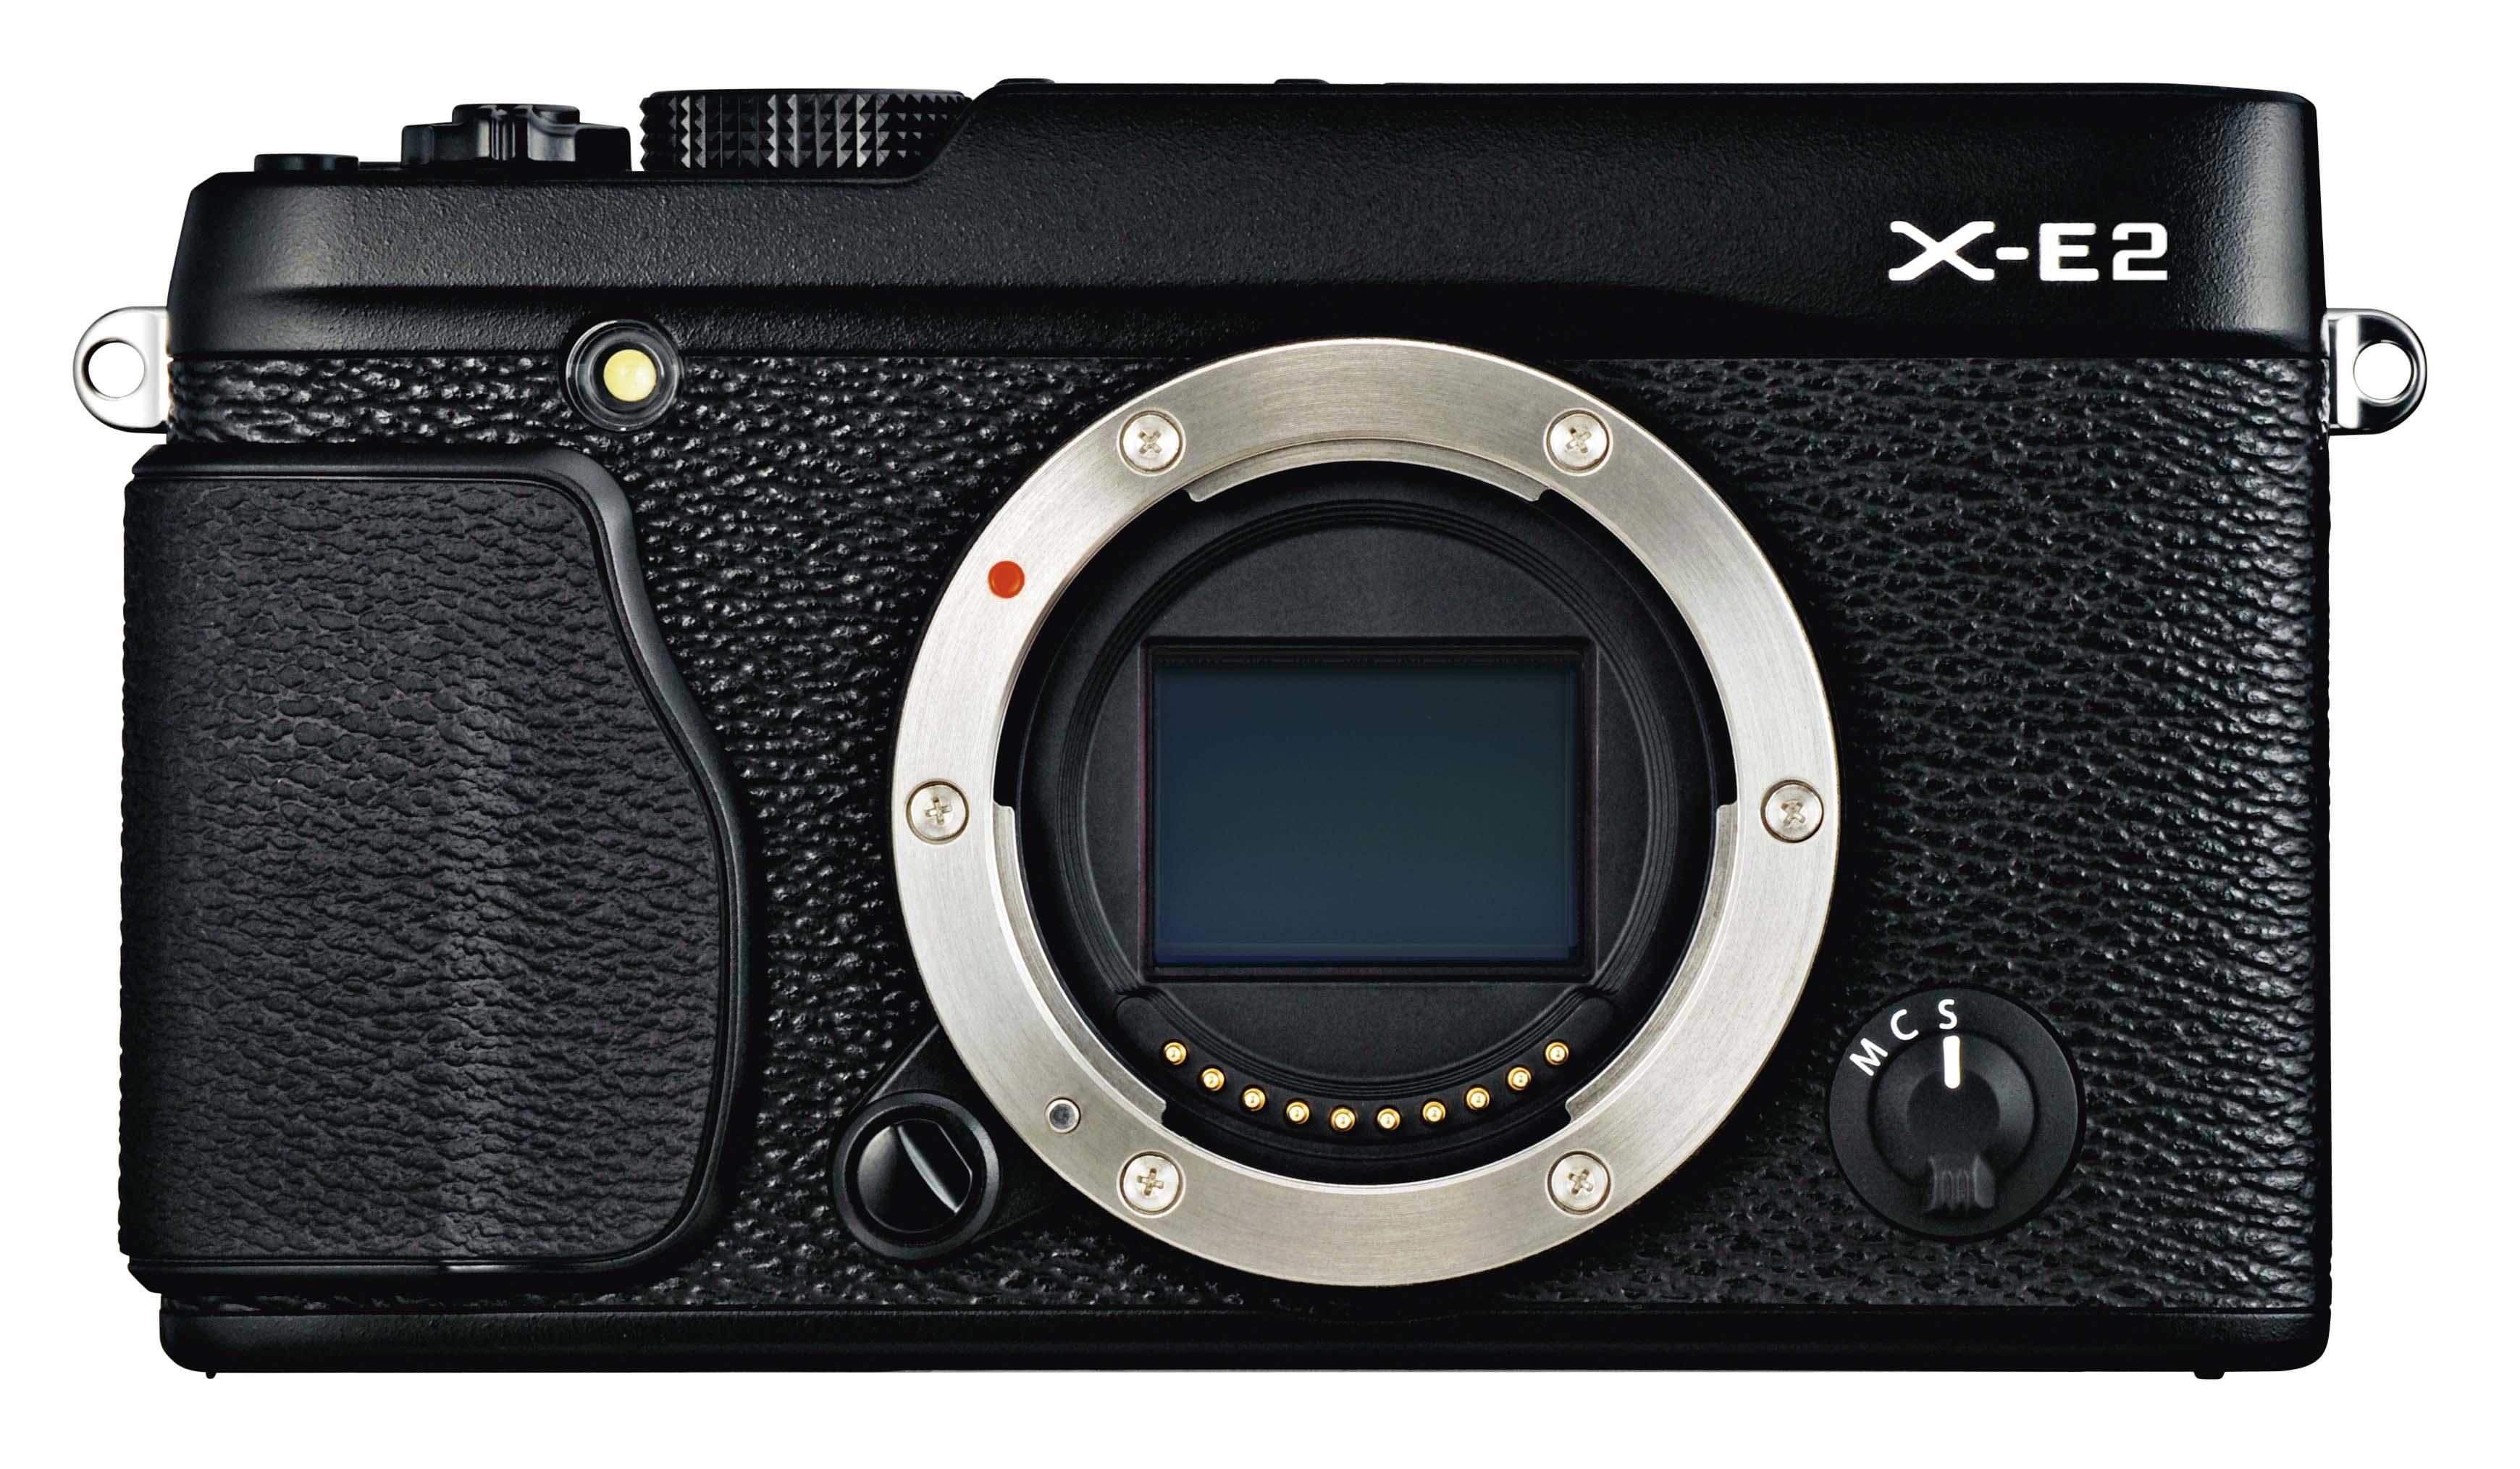 X-E2_Black_Front_CMOS